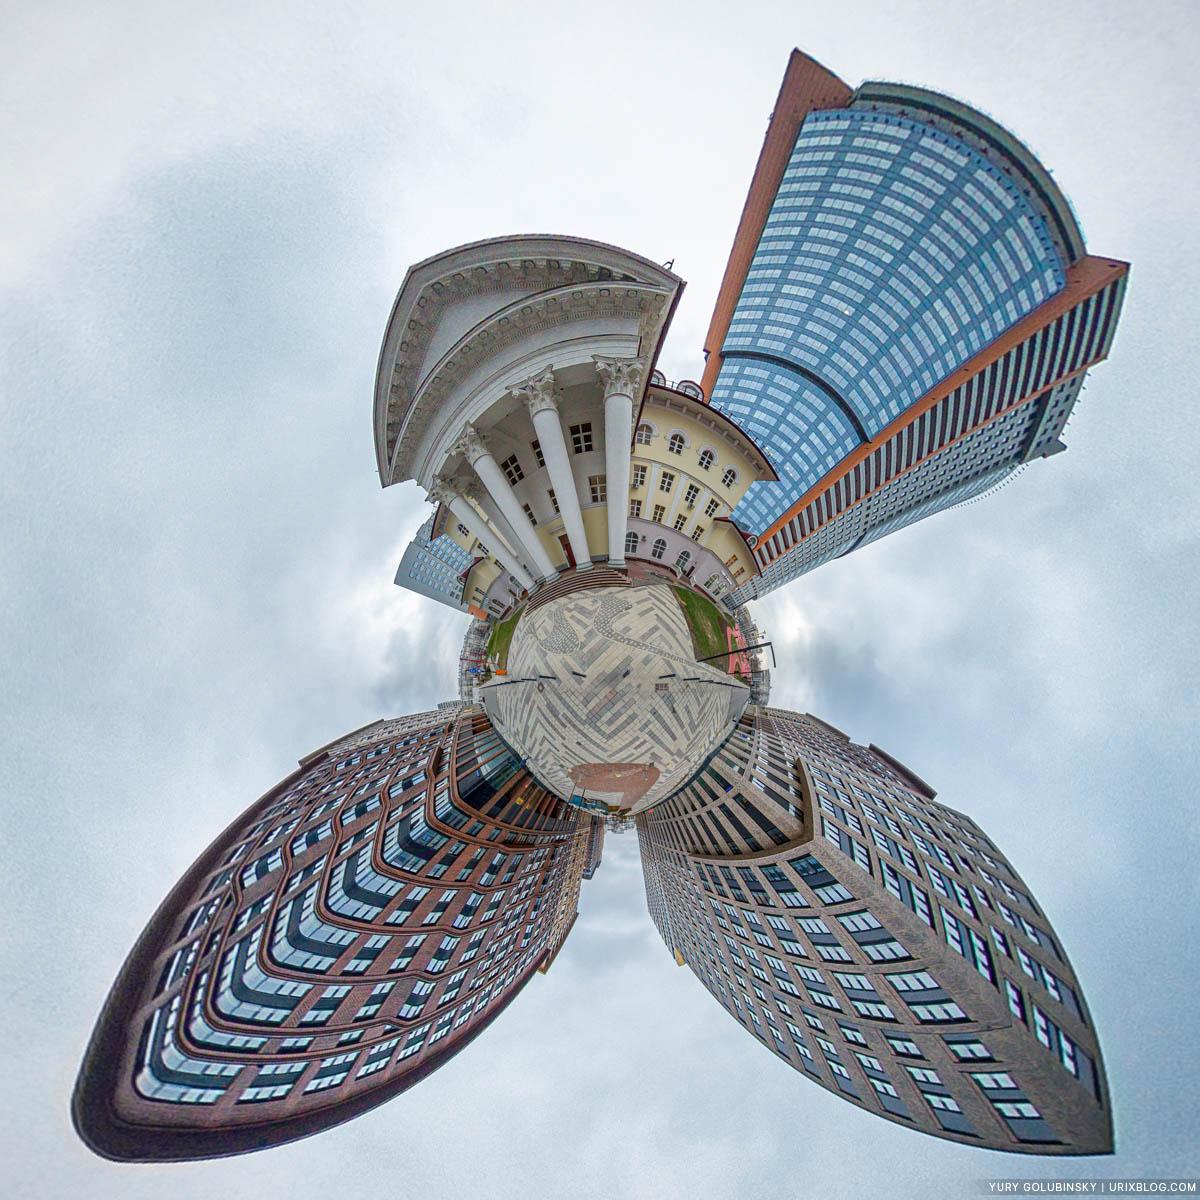 ЖК Царская Площадь, маленькая планета, панорама, Москва, Россия, 2020